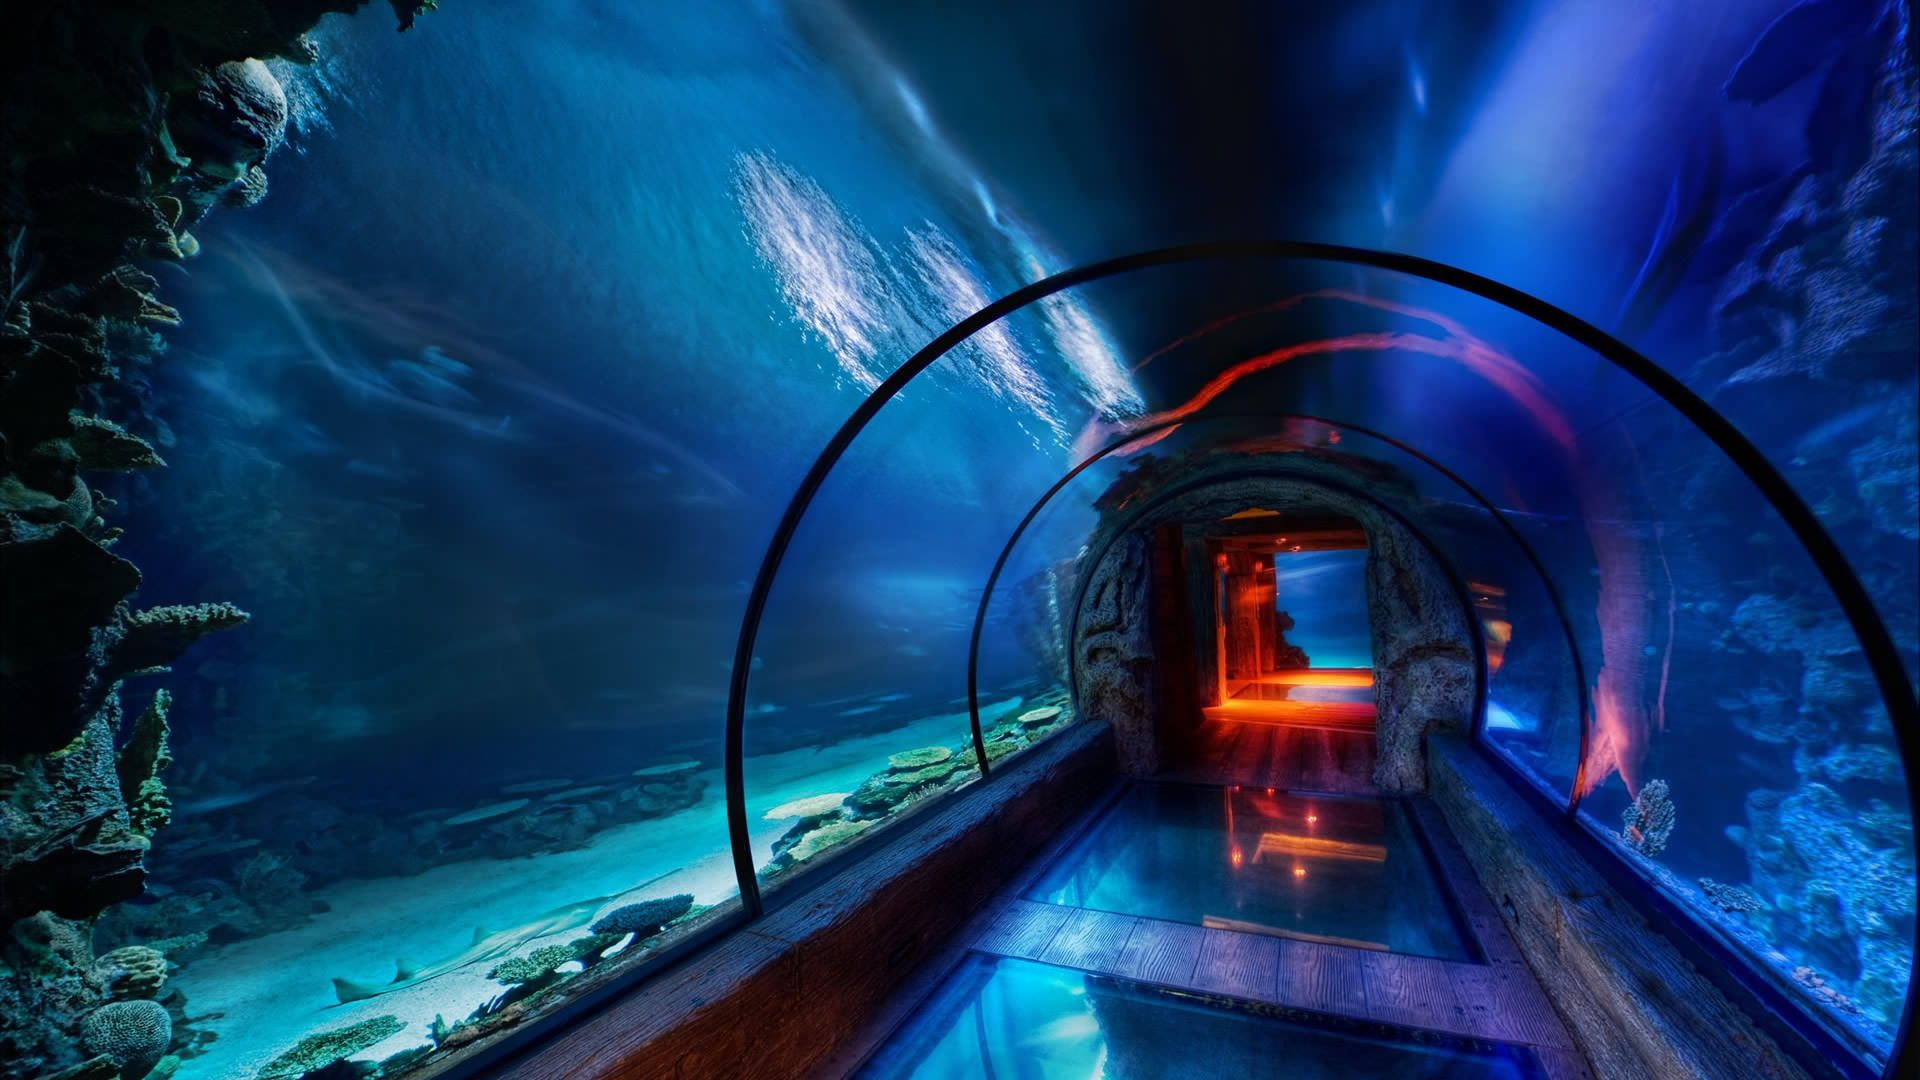 Underwater World Of Hawaii HD Wallpaper